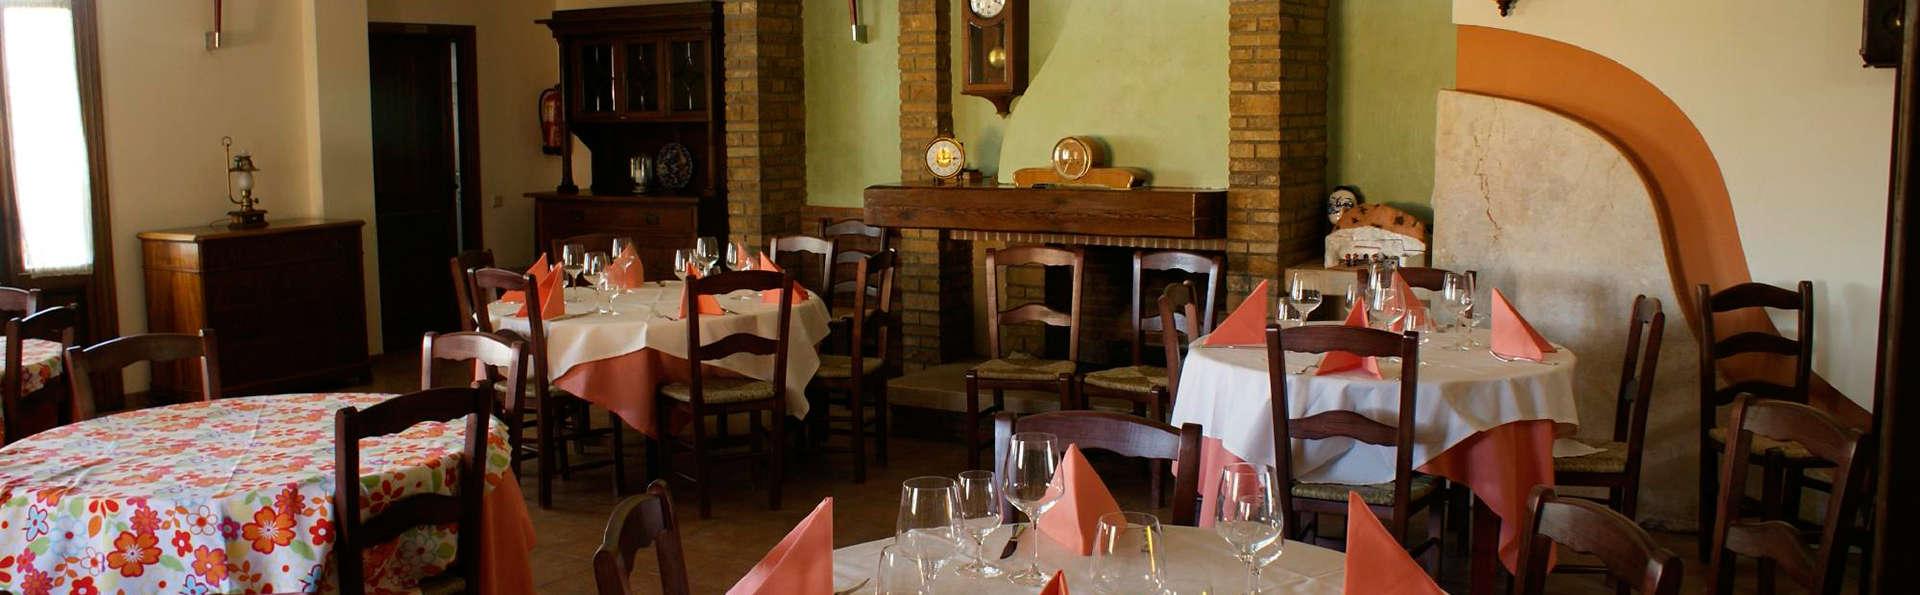 Cuevas la Granja-Francisco Rivera Navarro - EDIT_restaurant3.jpg